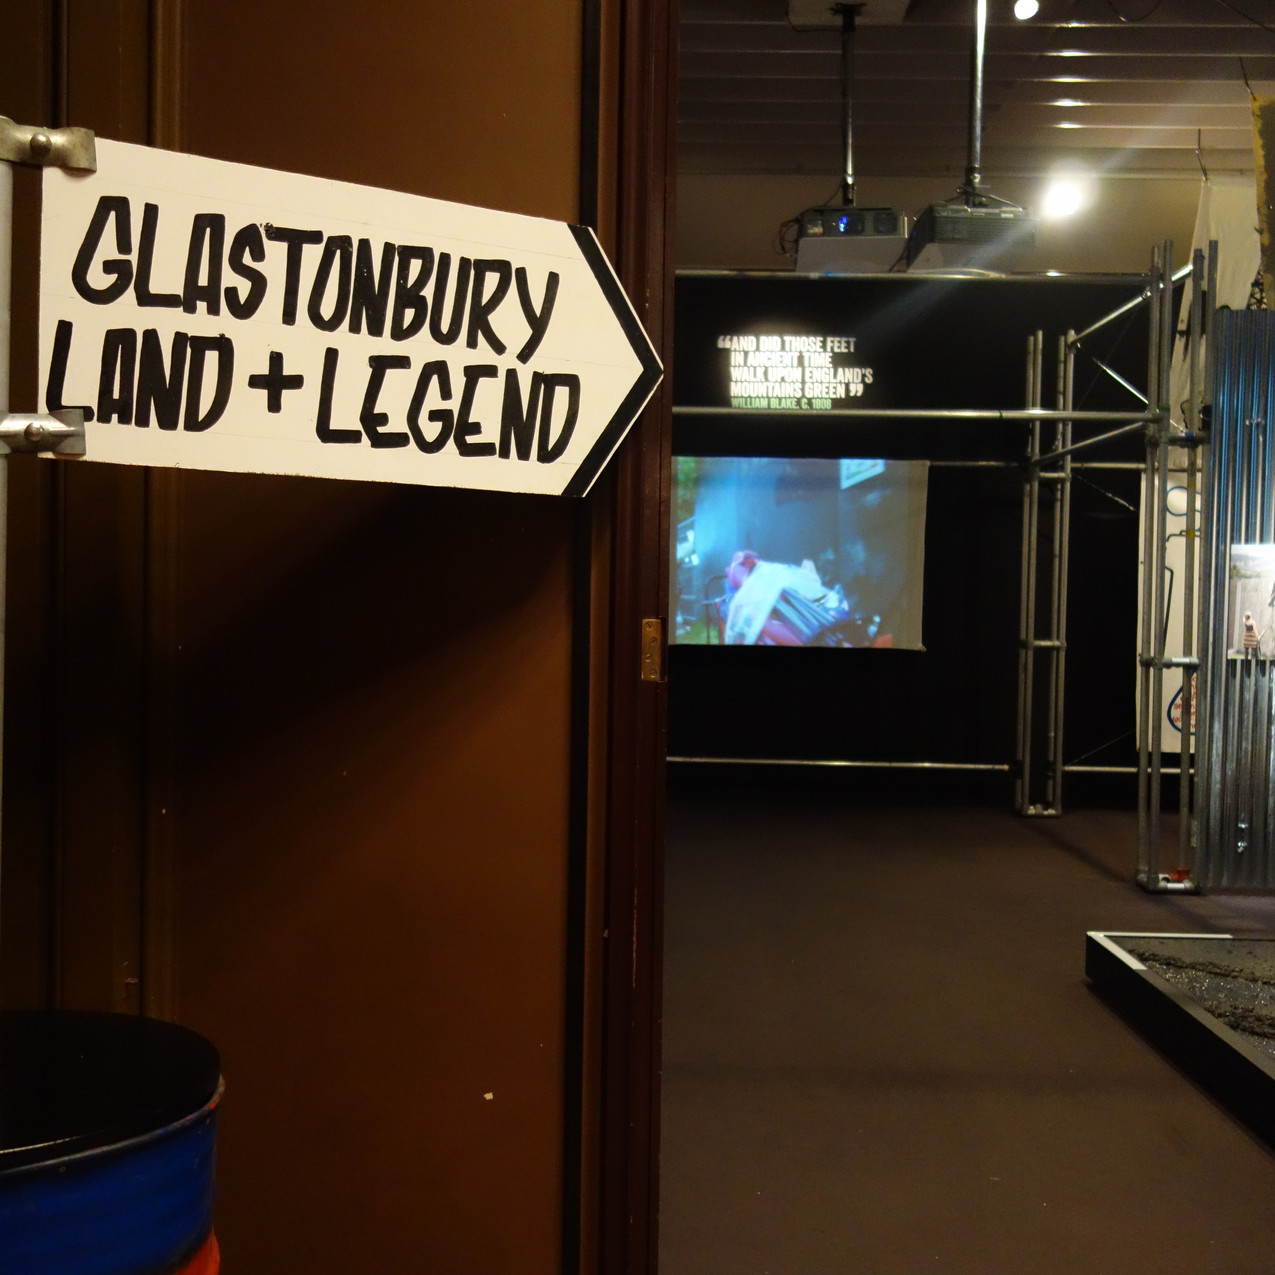 Glastonbury Land and Legend